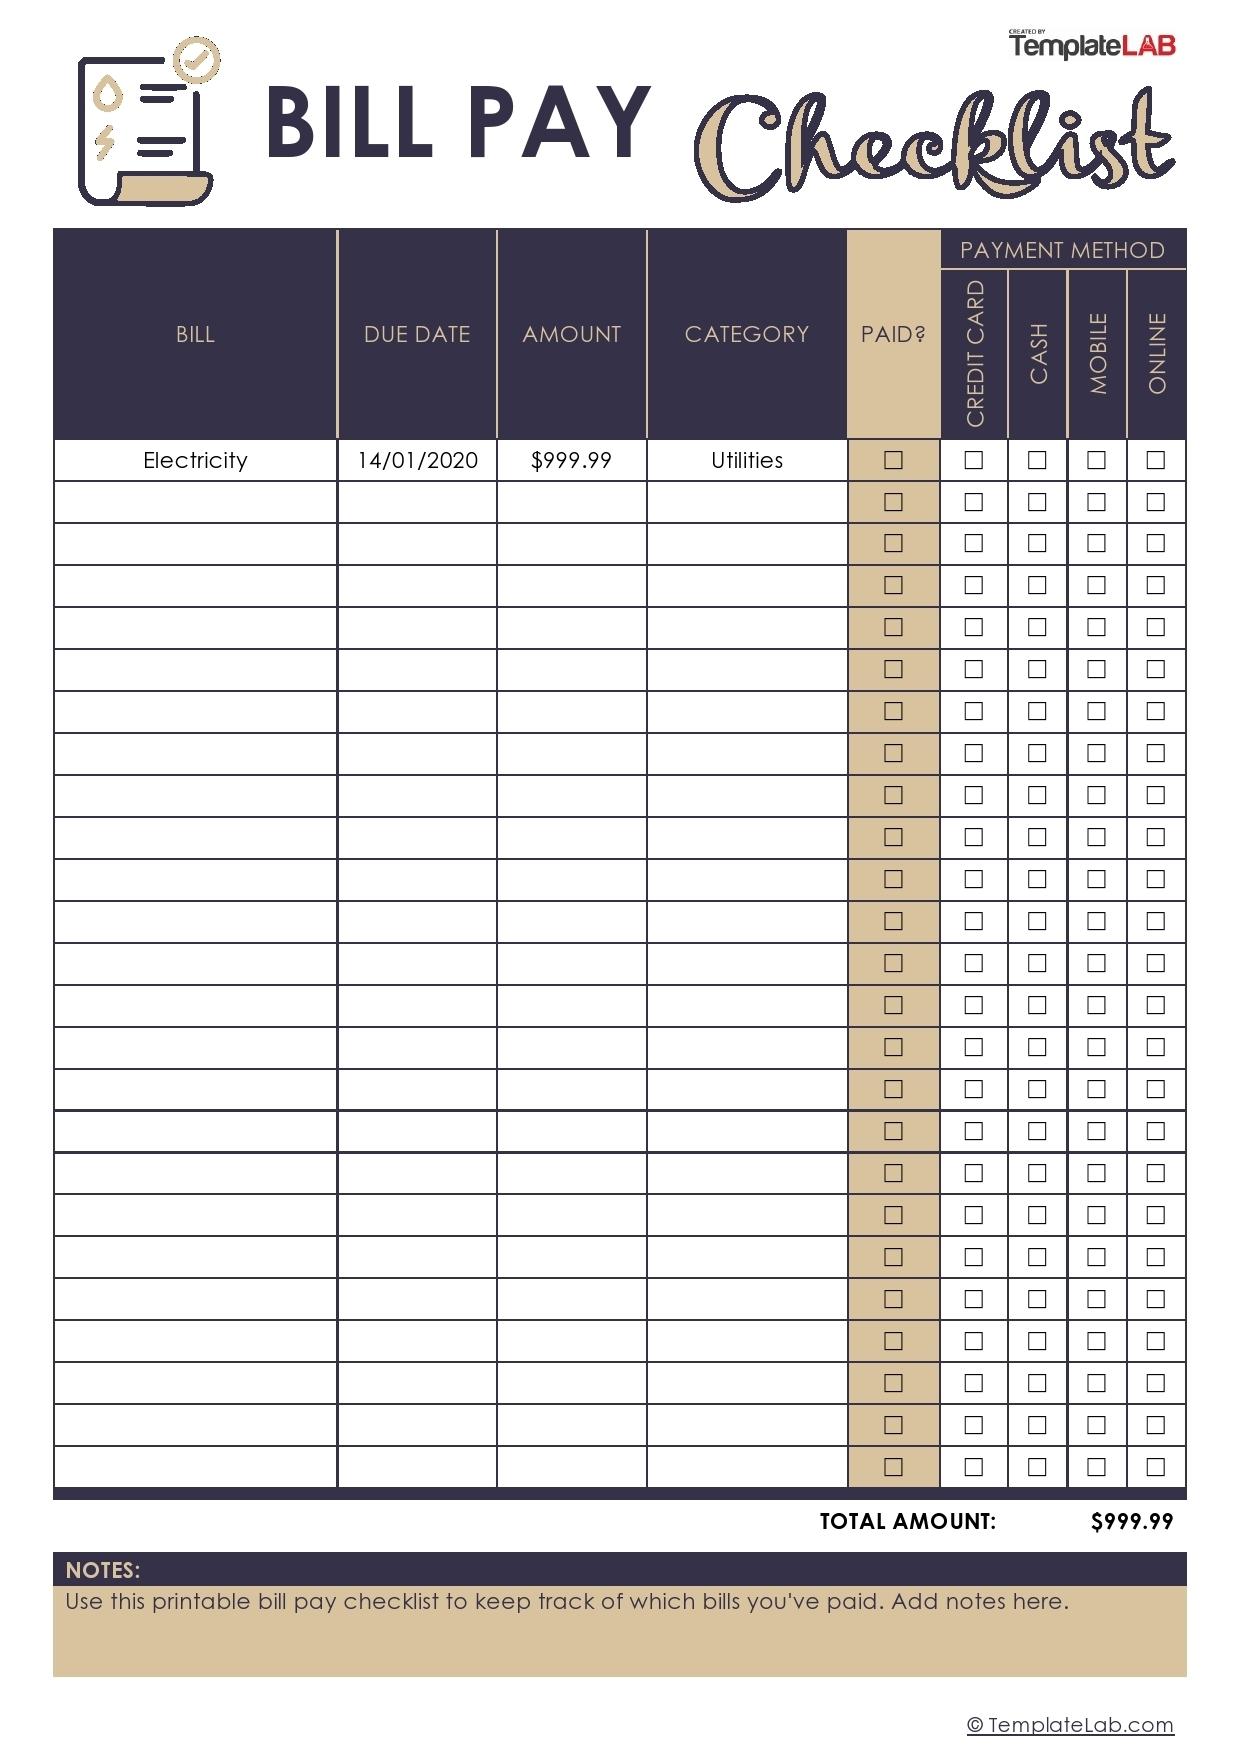 33 Free Bill Pay Checklists & Bill Calendars (Pdf, Word & Excel)